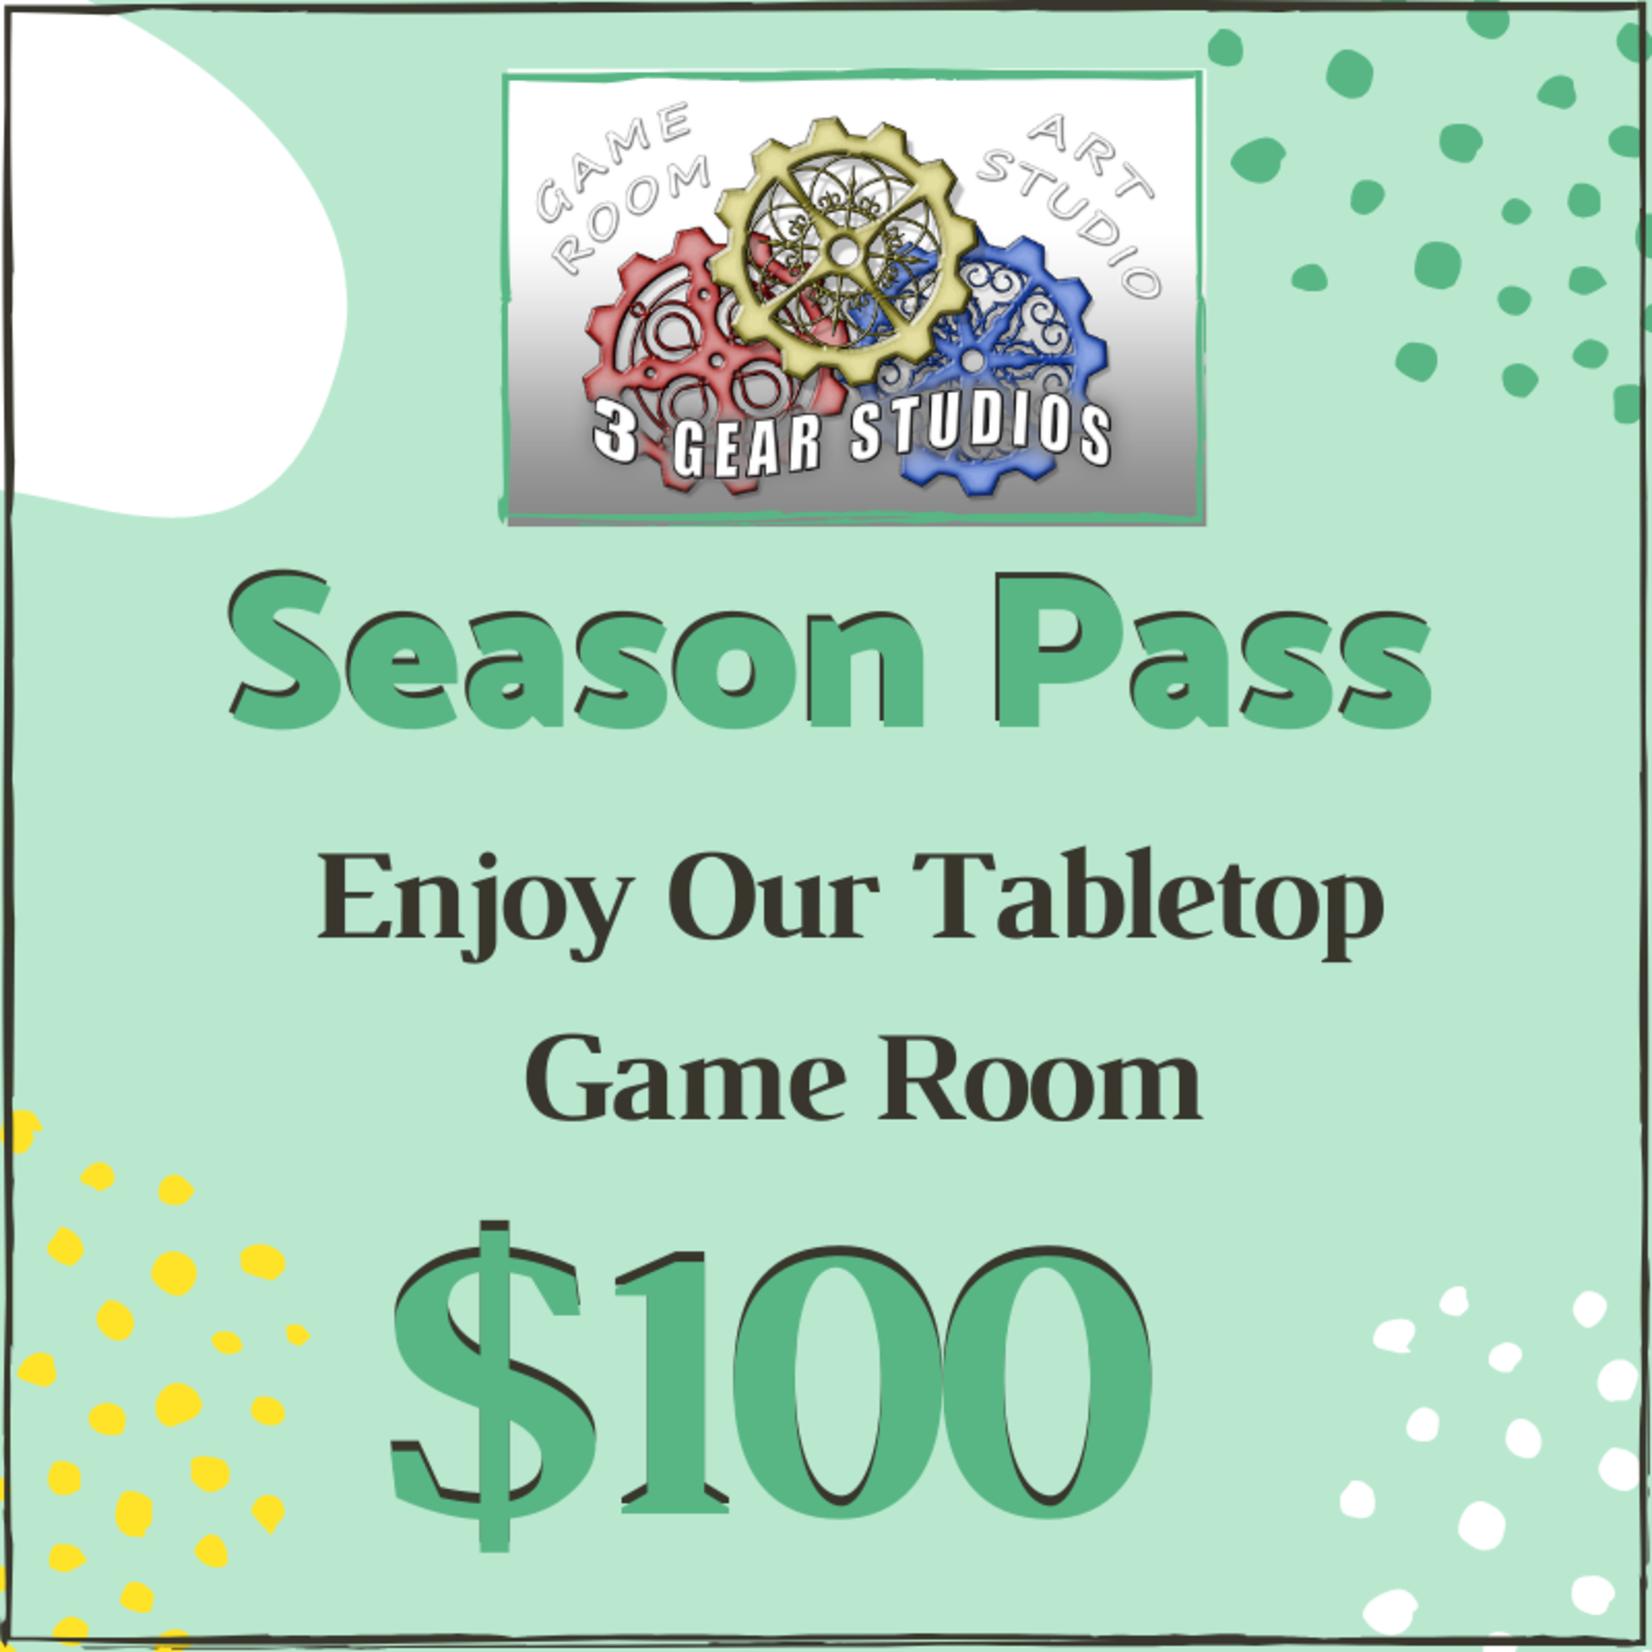 Game Room: Season Pass